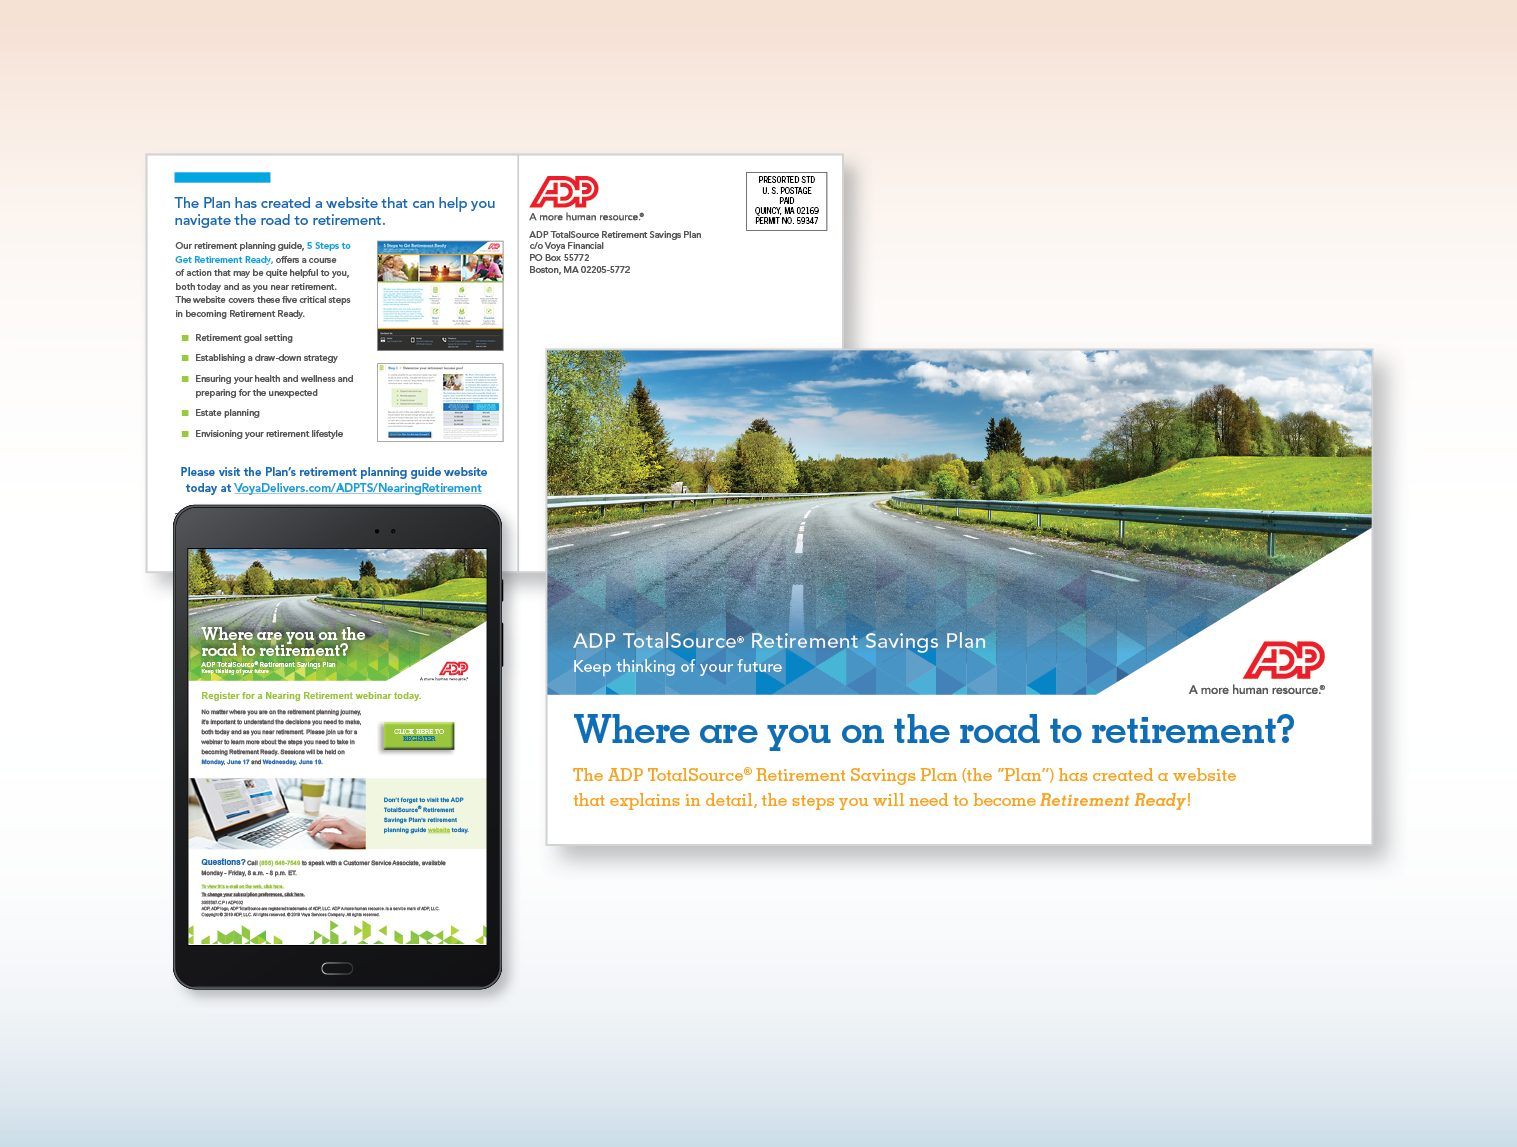 ADP nearing retirement